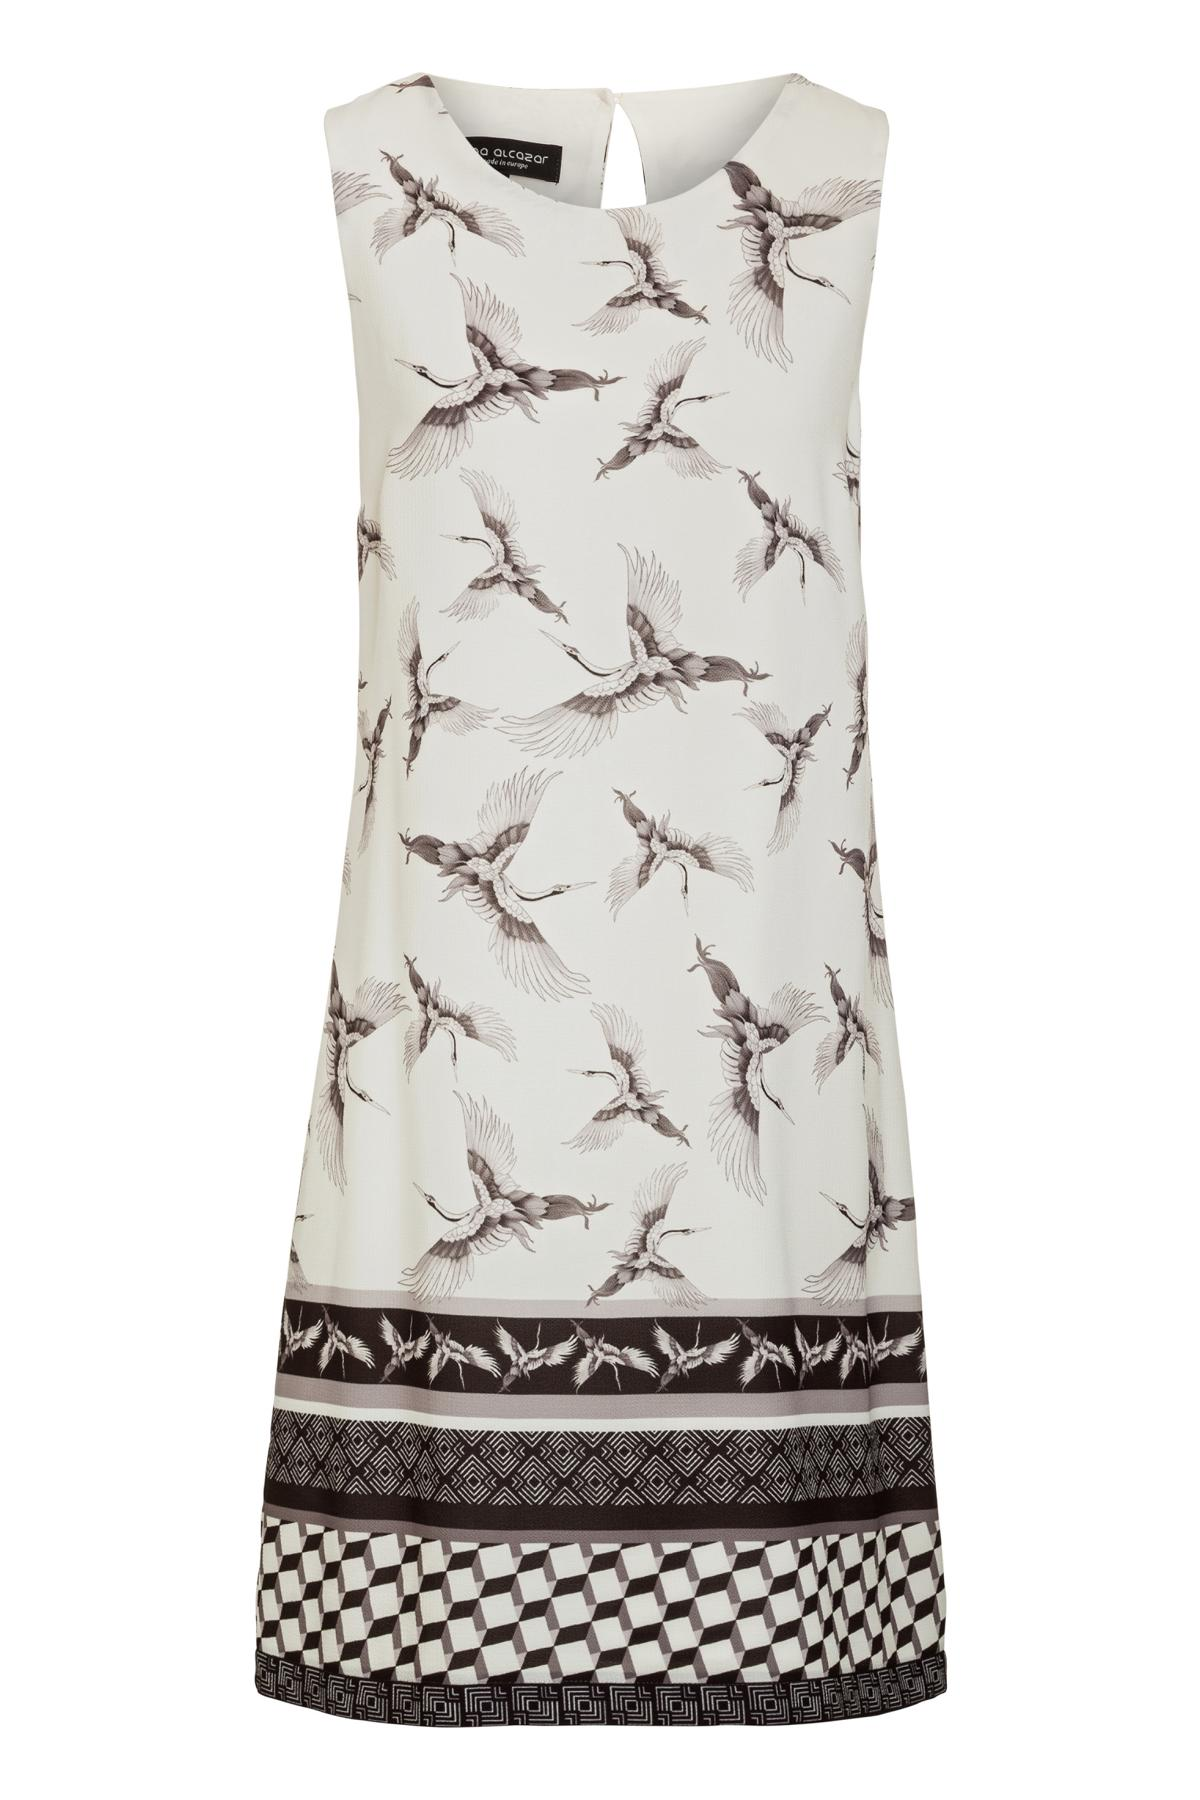 Ana Alcazar A-Linien Kleid  Meilea White